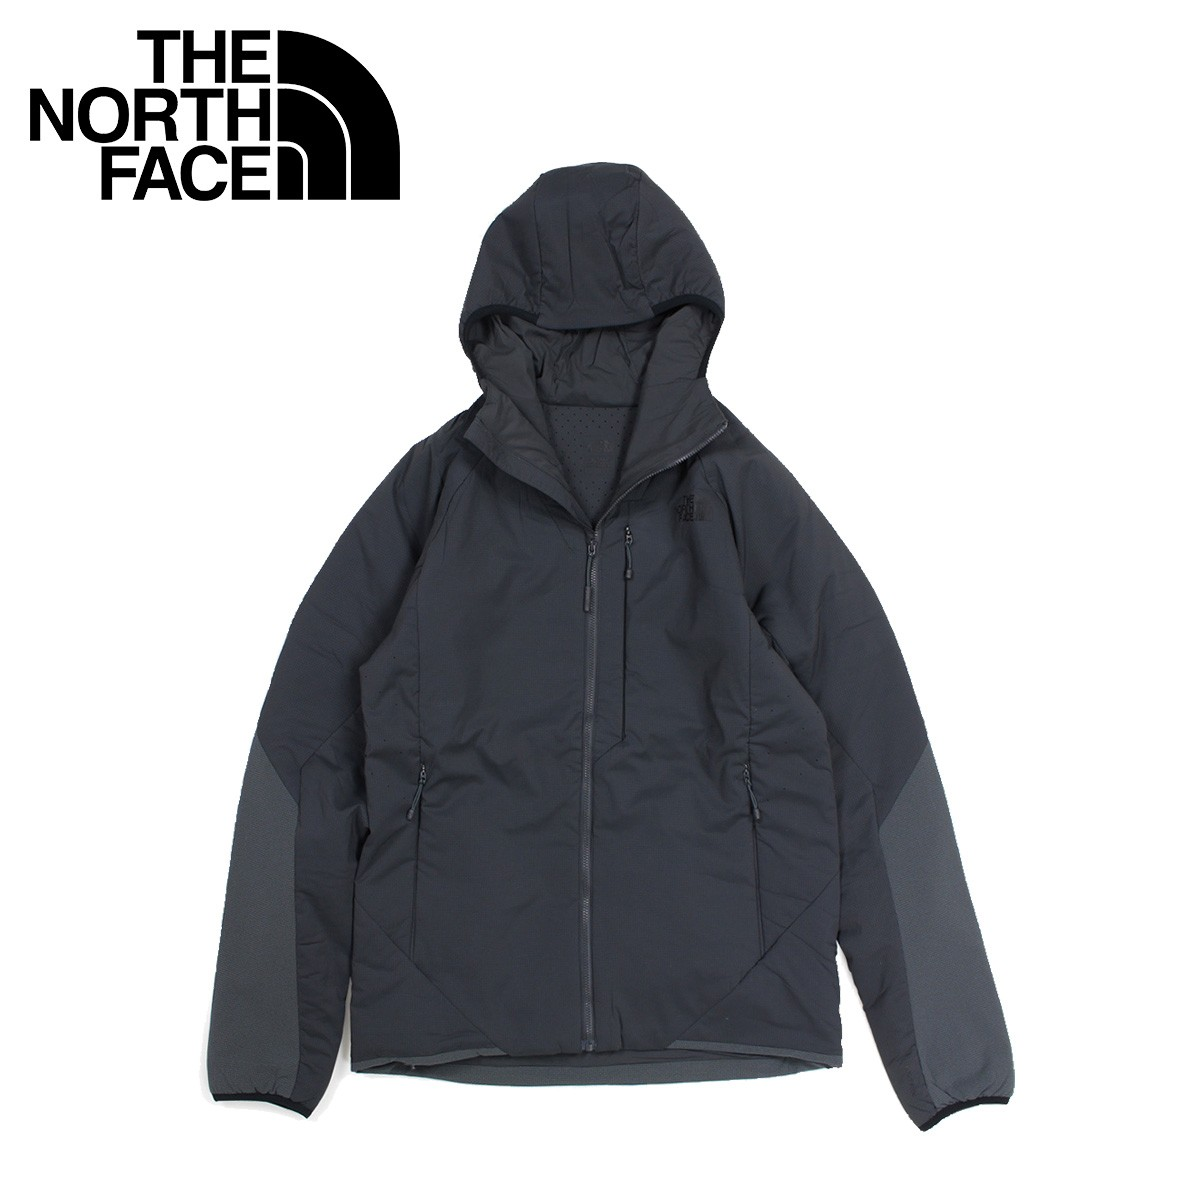 THE NORTH FACE MENS VENTRIX HOODY ノースフェイス ジャケット マウンテンパーカー メンズ ブラック NF0A39ND [3/7 新入荷] [183]